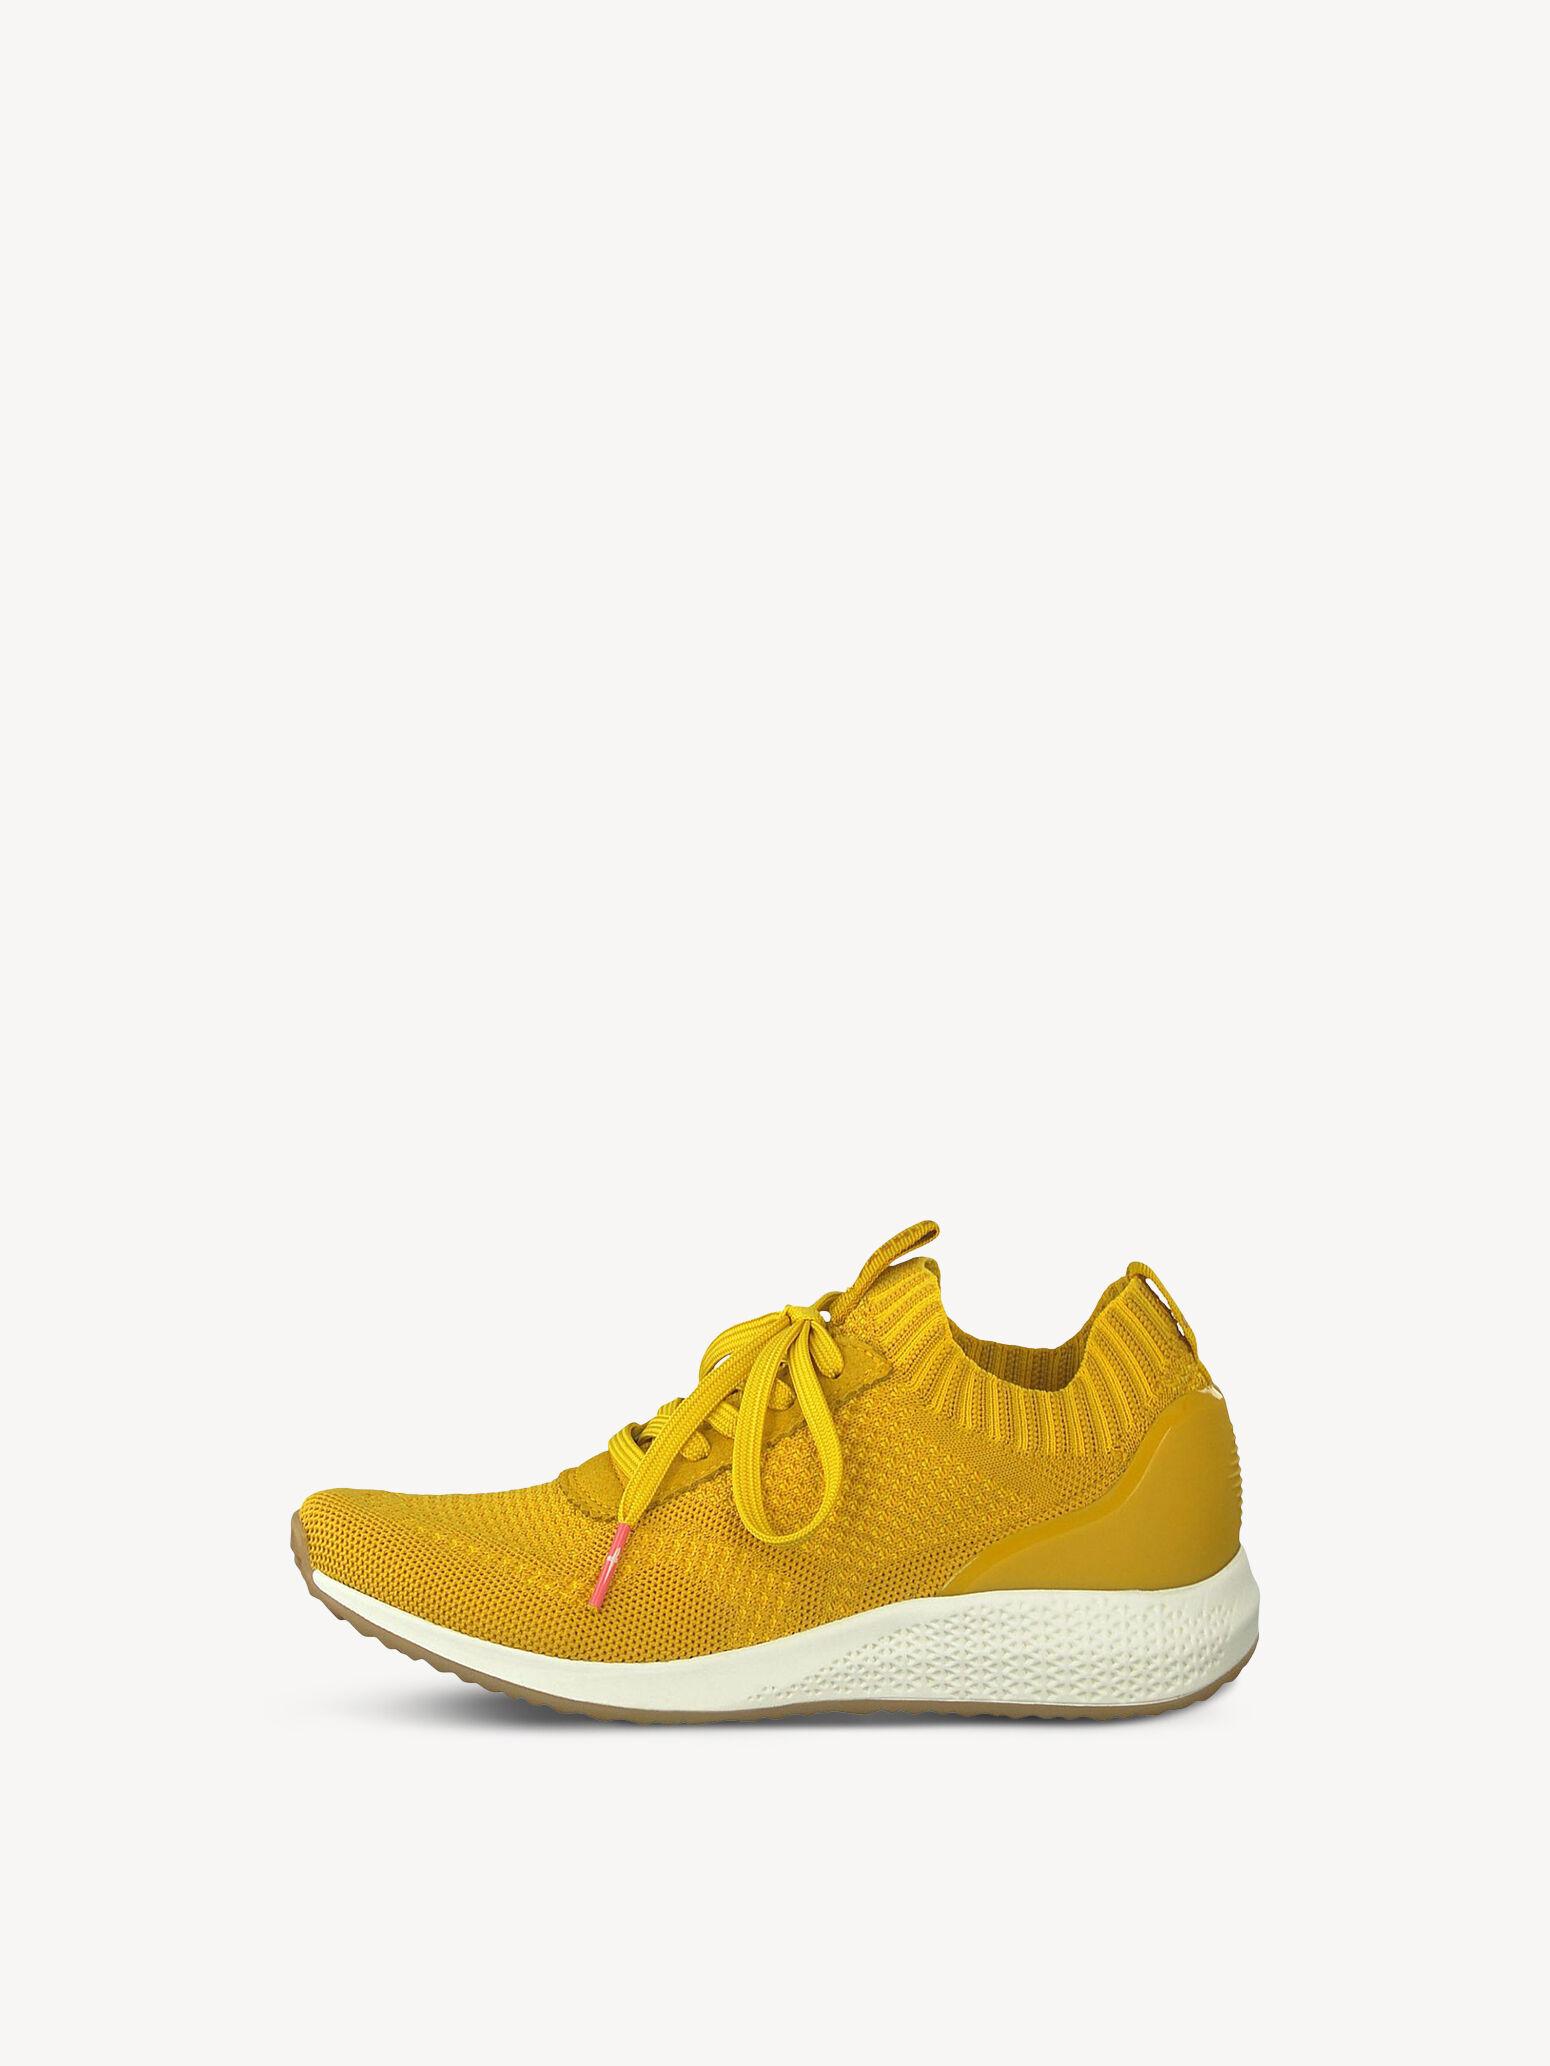 Femmes Chaussures Femmes Tamaris Femmes Chaussures Baskets Femmes Chaussures Chaussures Tamaris Baskets Tamaris Tamaris Baskets 354RqALj